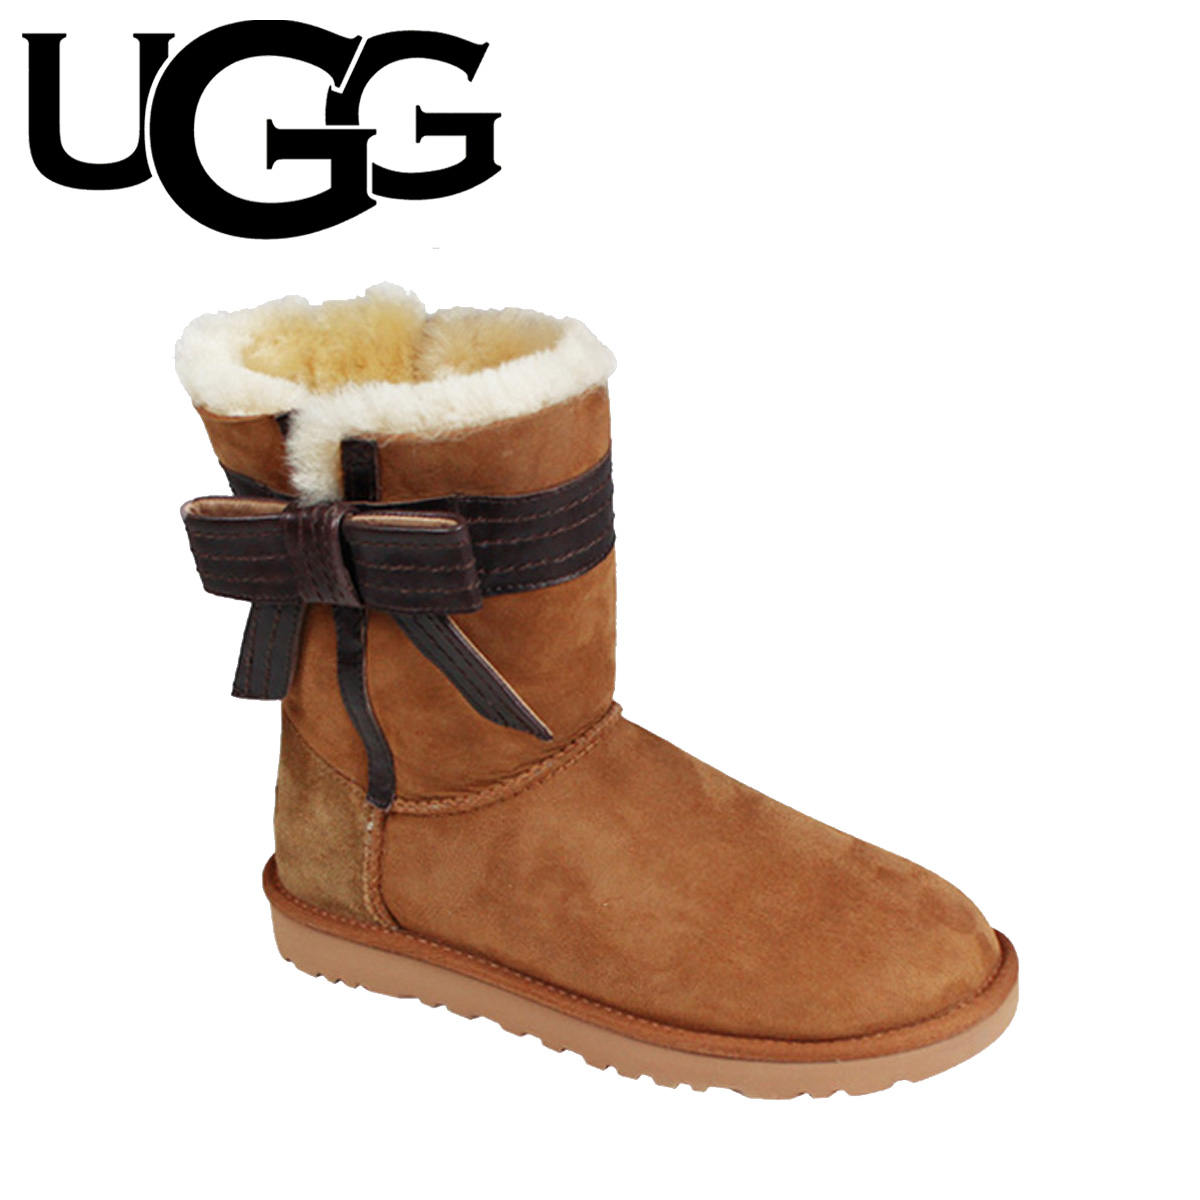 Ugg Josette Shop